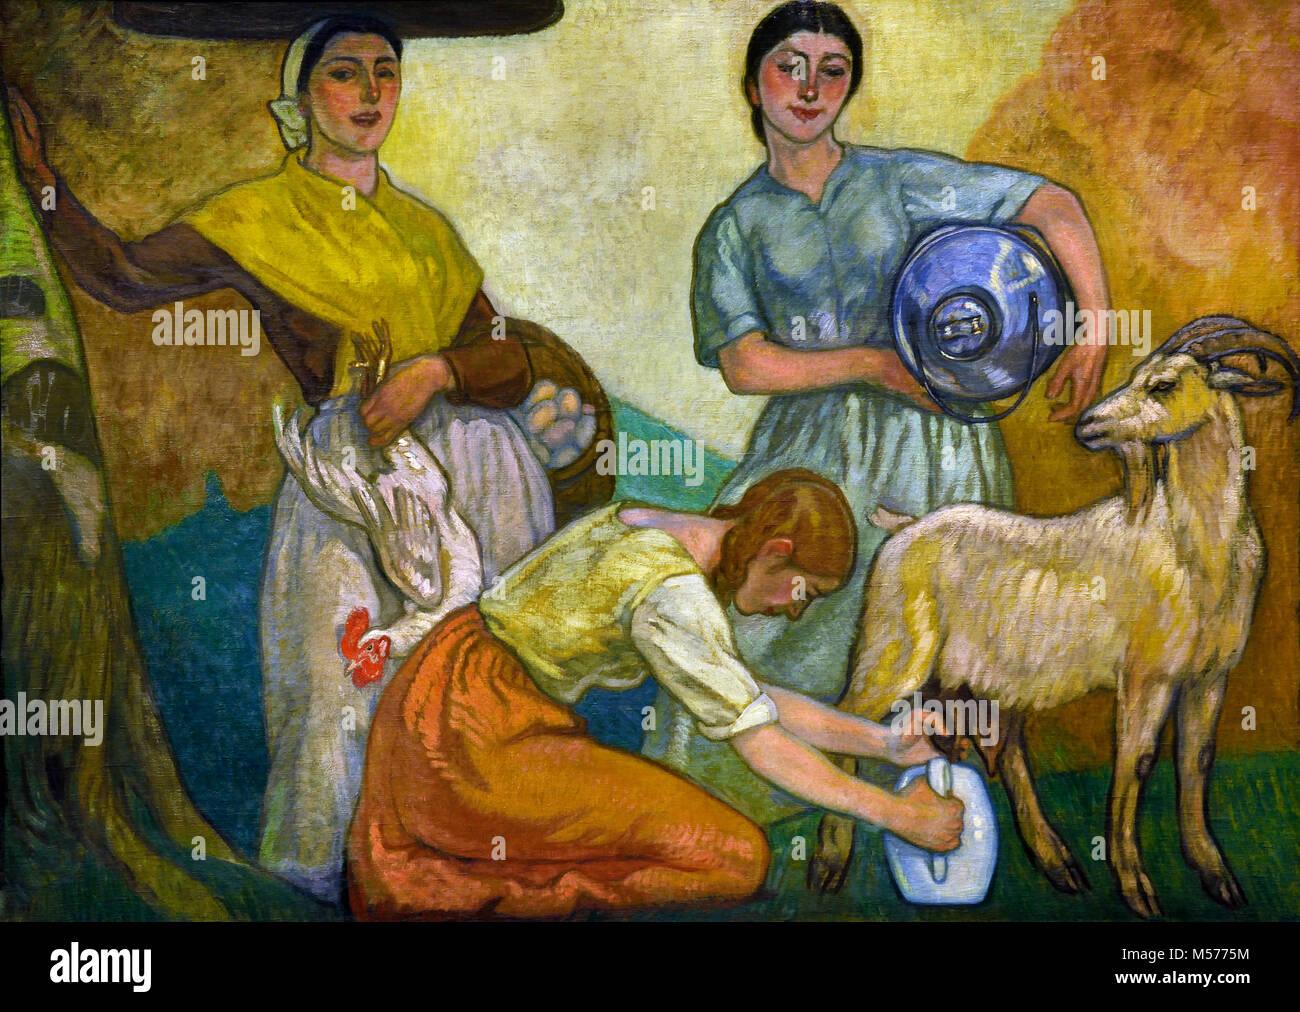 To Market 1913 by  Arteta - Aurelio, 20th, century, Spain, Spanish, Bilbao 1879 Mexico City, 1940 - Stock Image